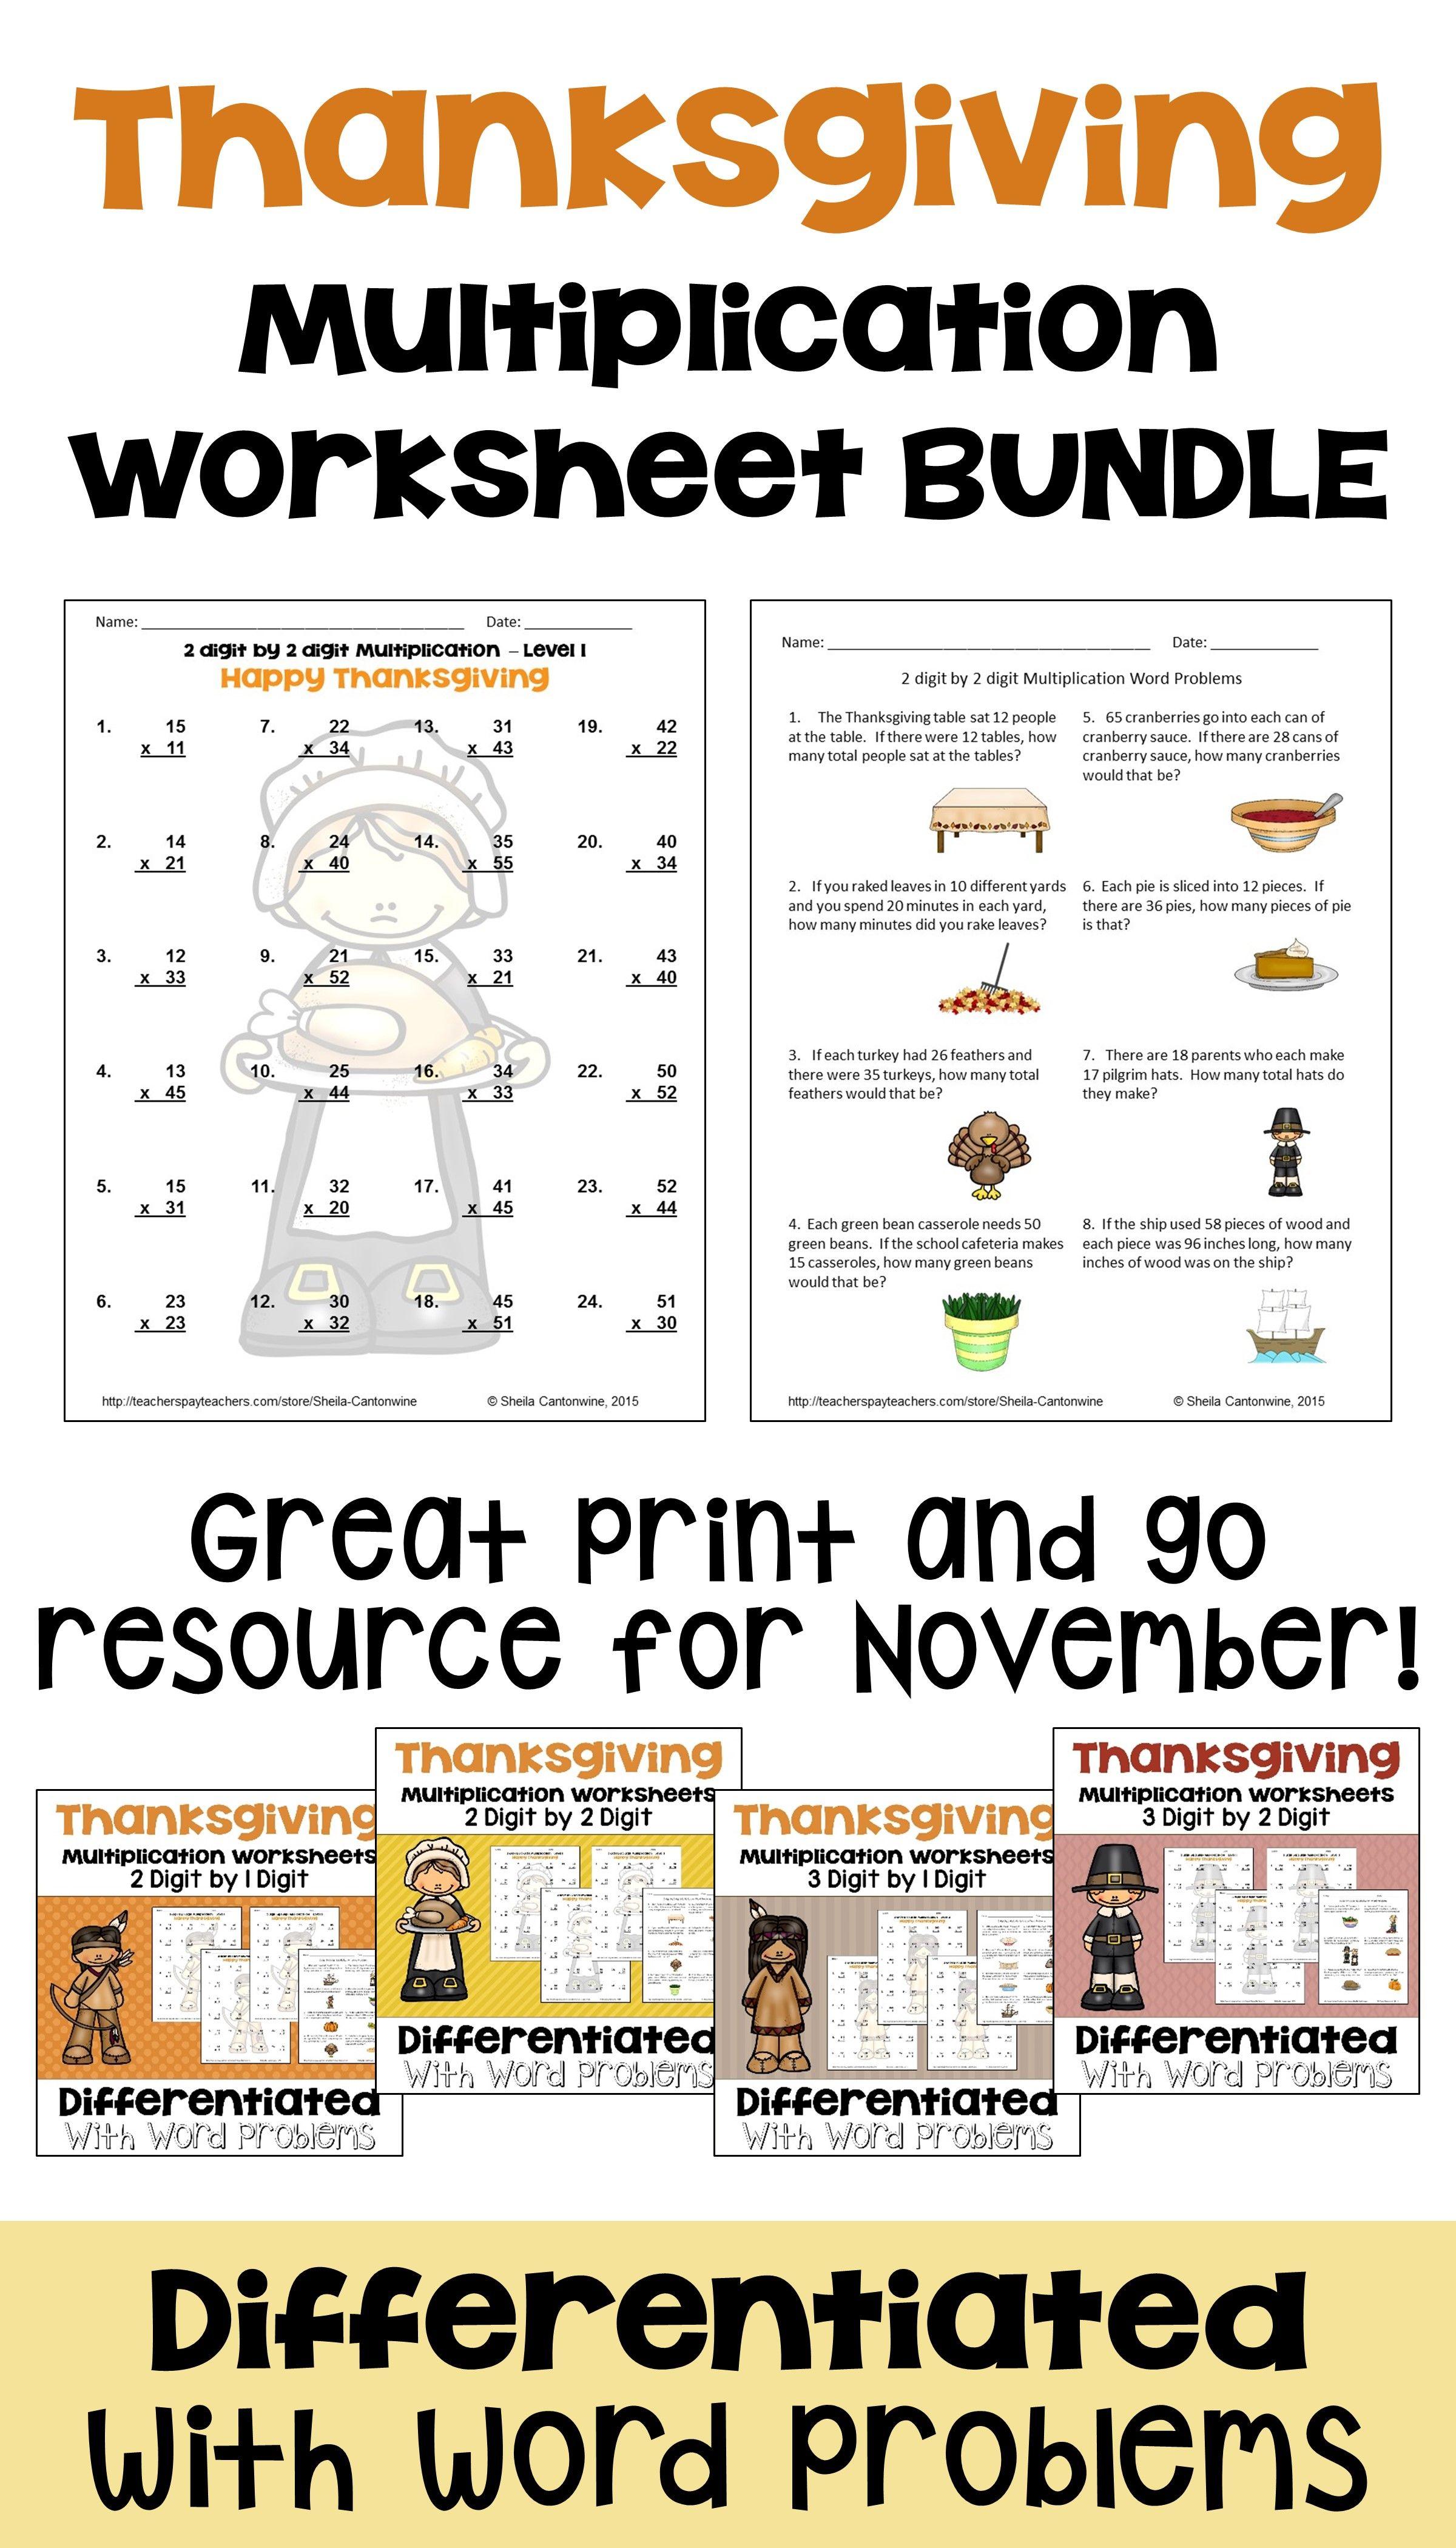 medium resolution of Thanksgiving Multiplication Worksheet Bundle with Word Problems   Thanksgiving  math